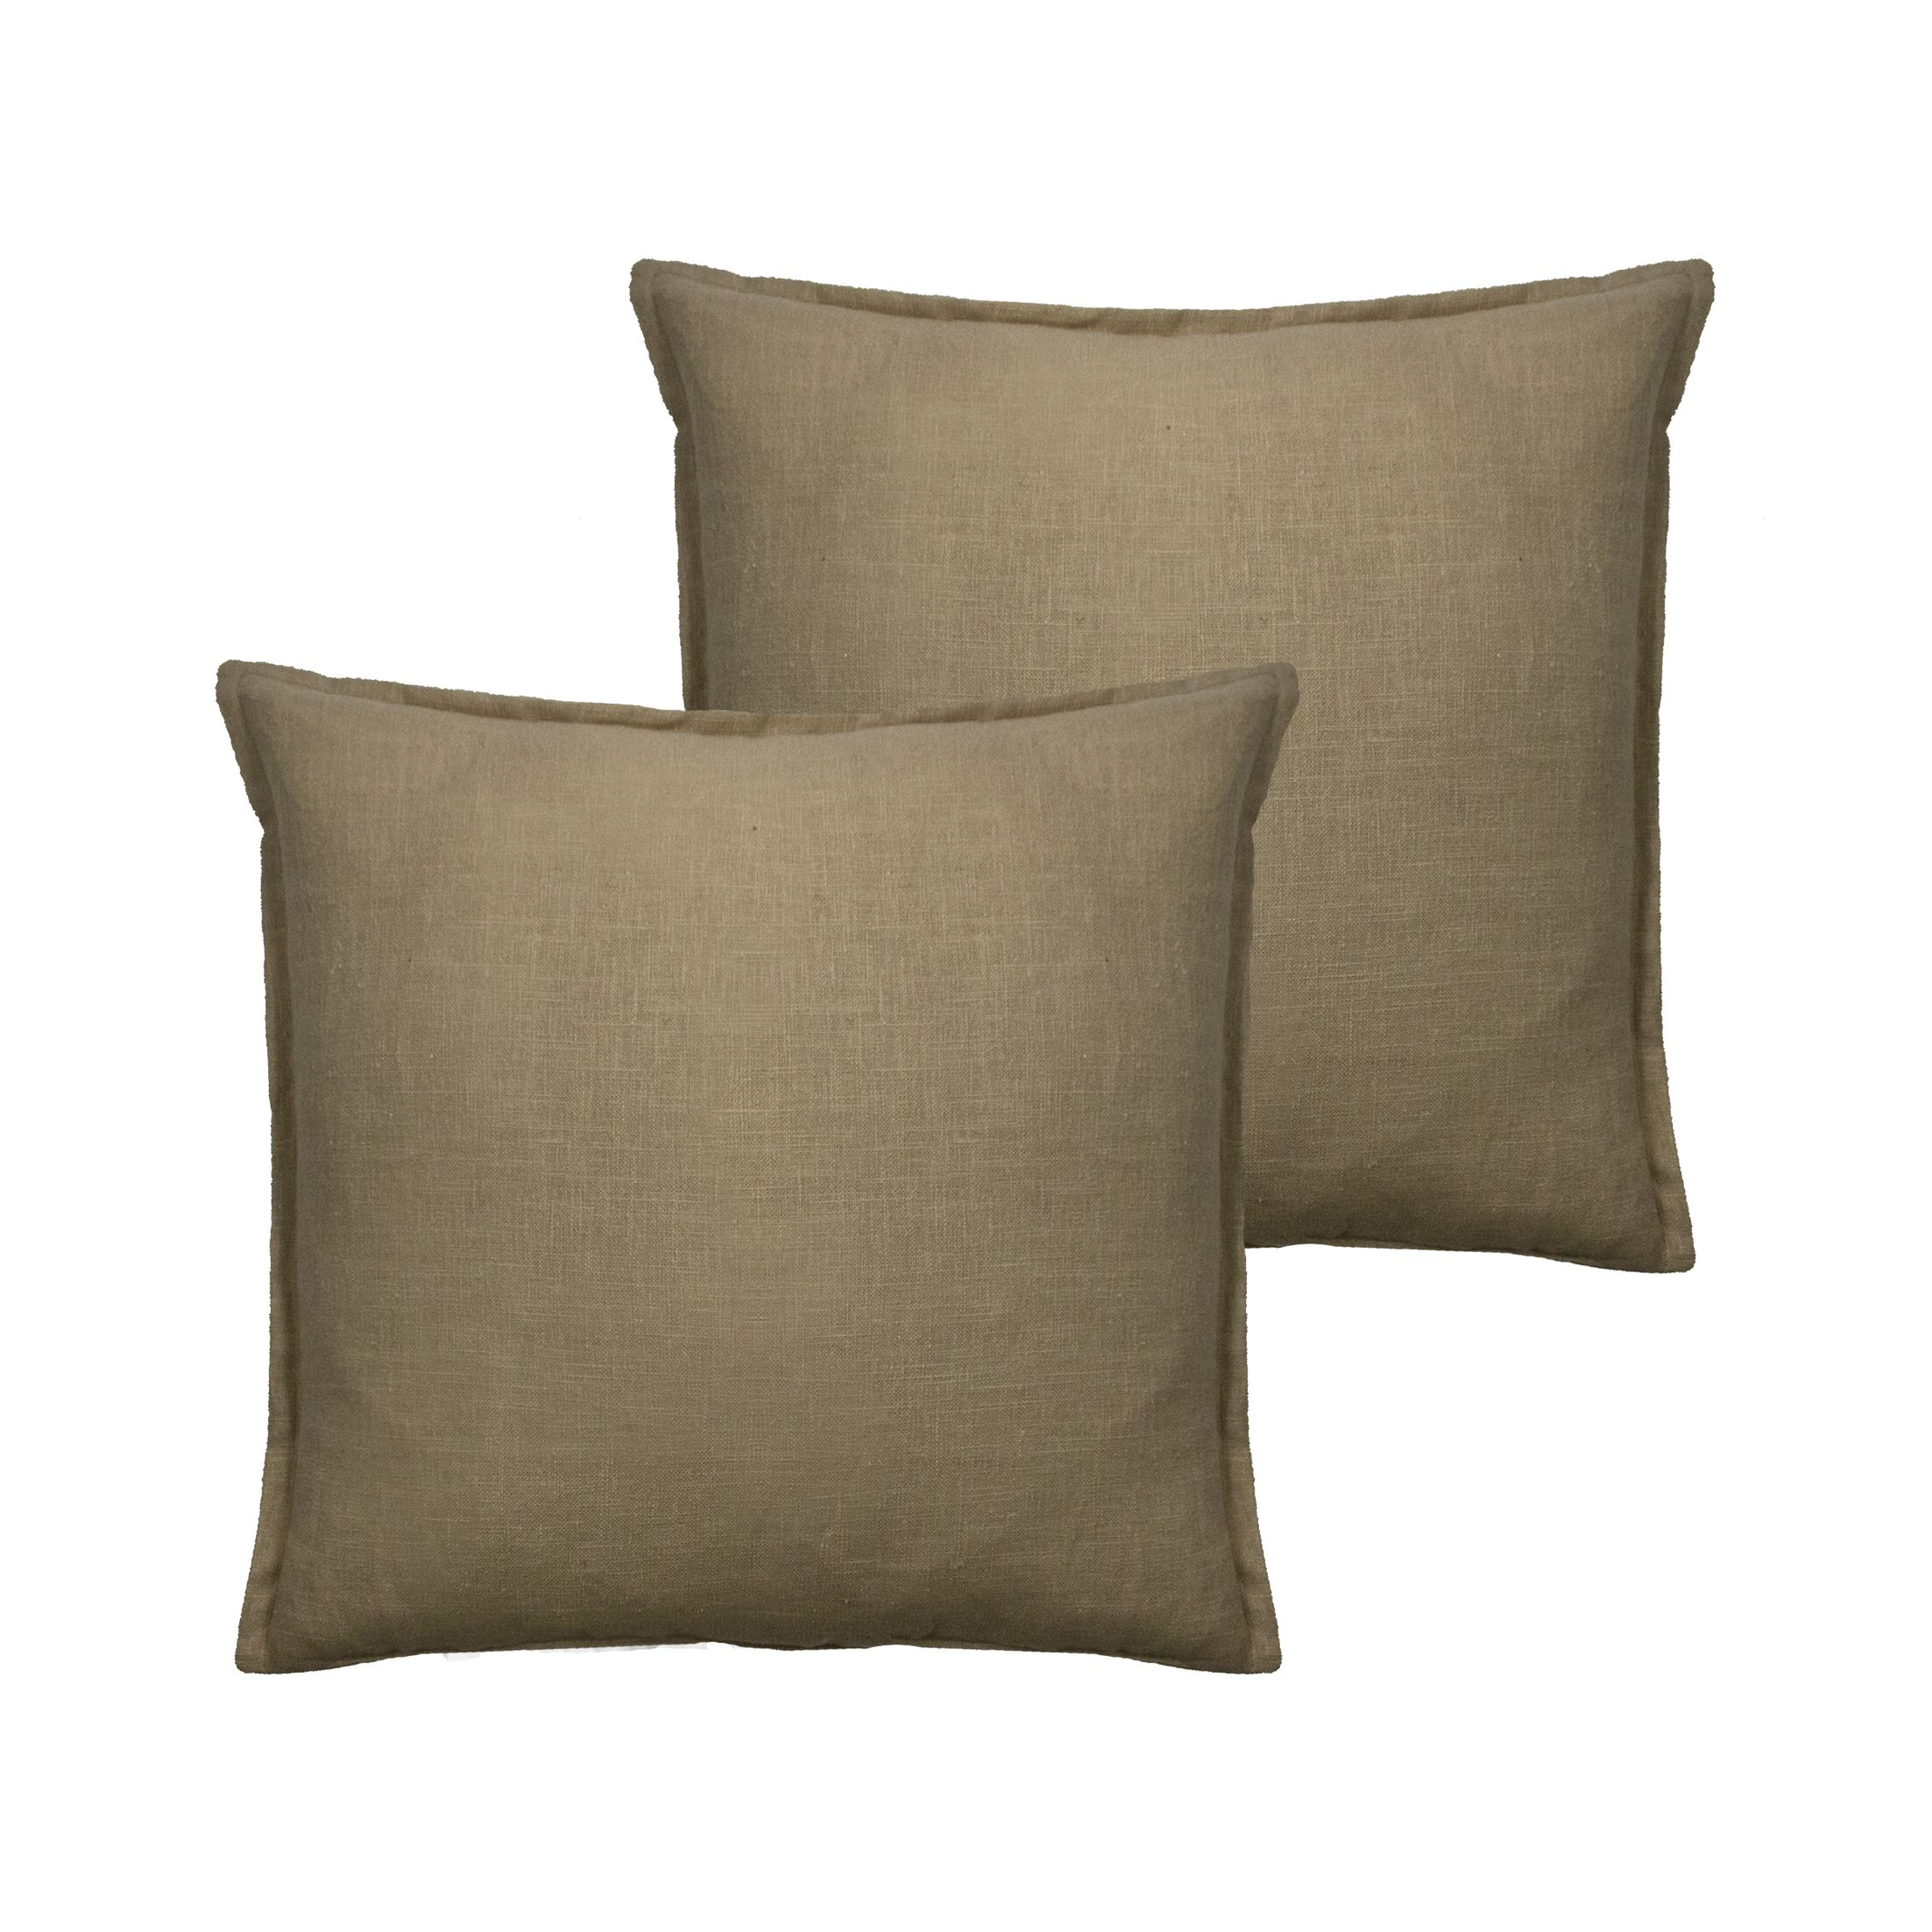 Lombard Reversible Decorative Linen Throw Pillow Color: Ecru